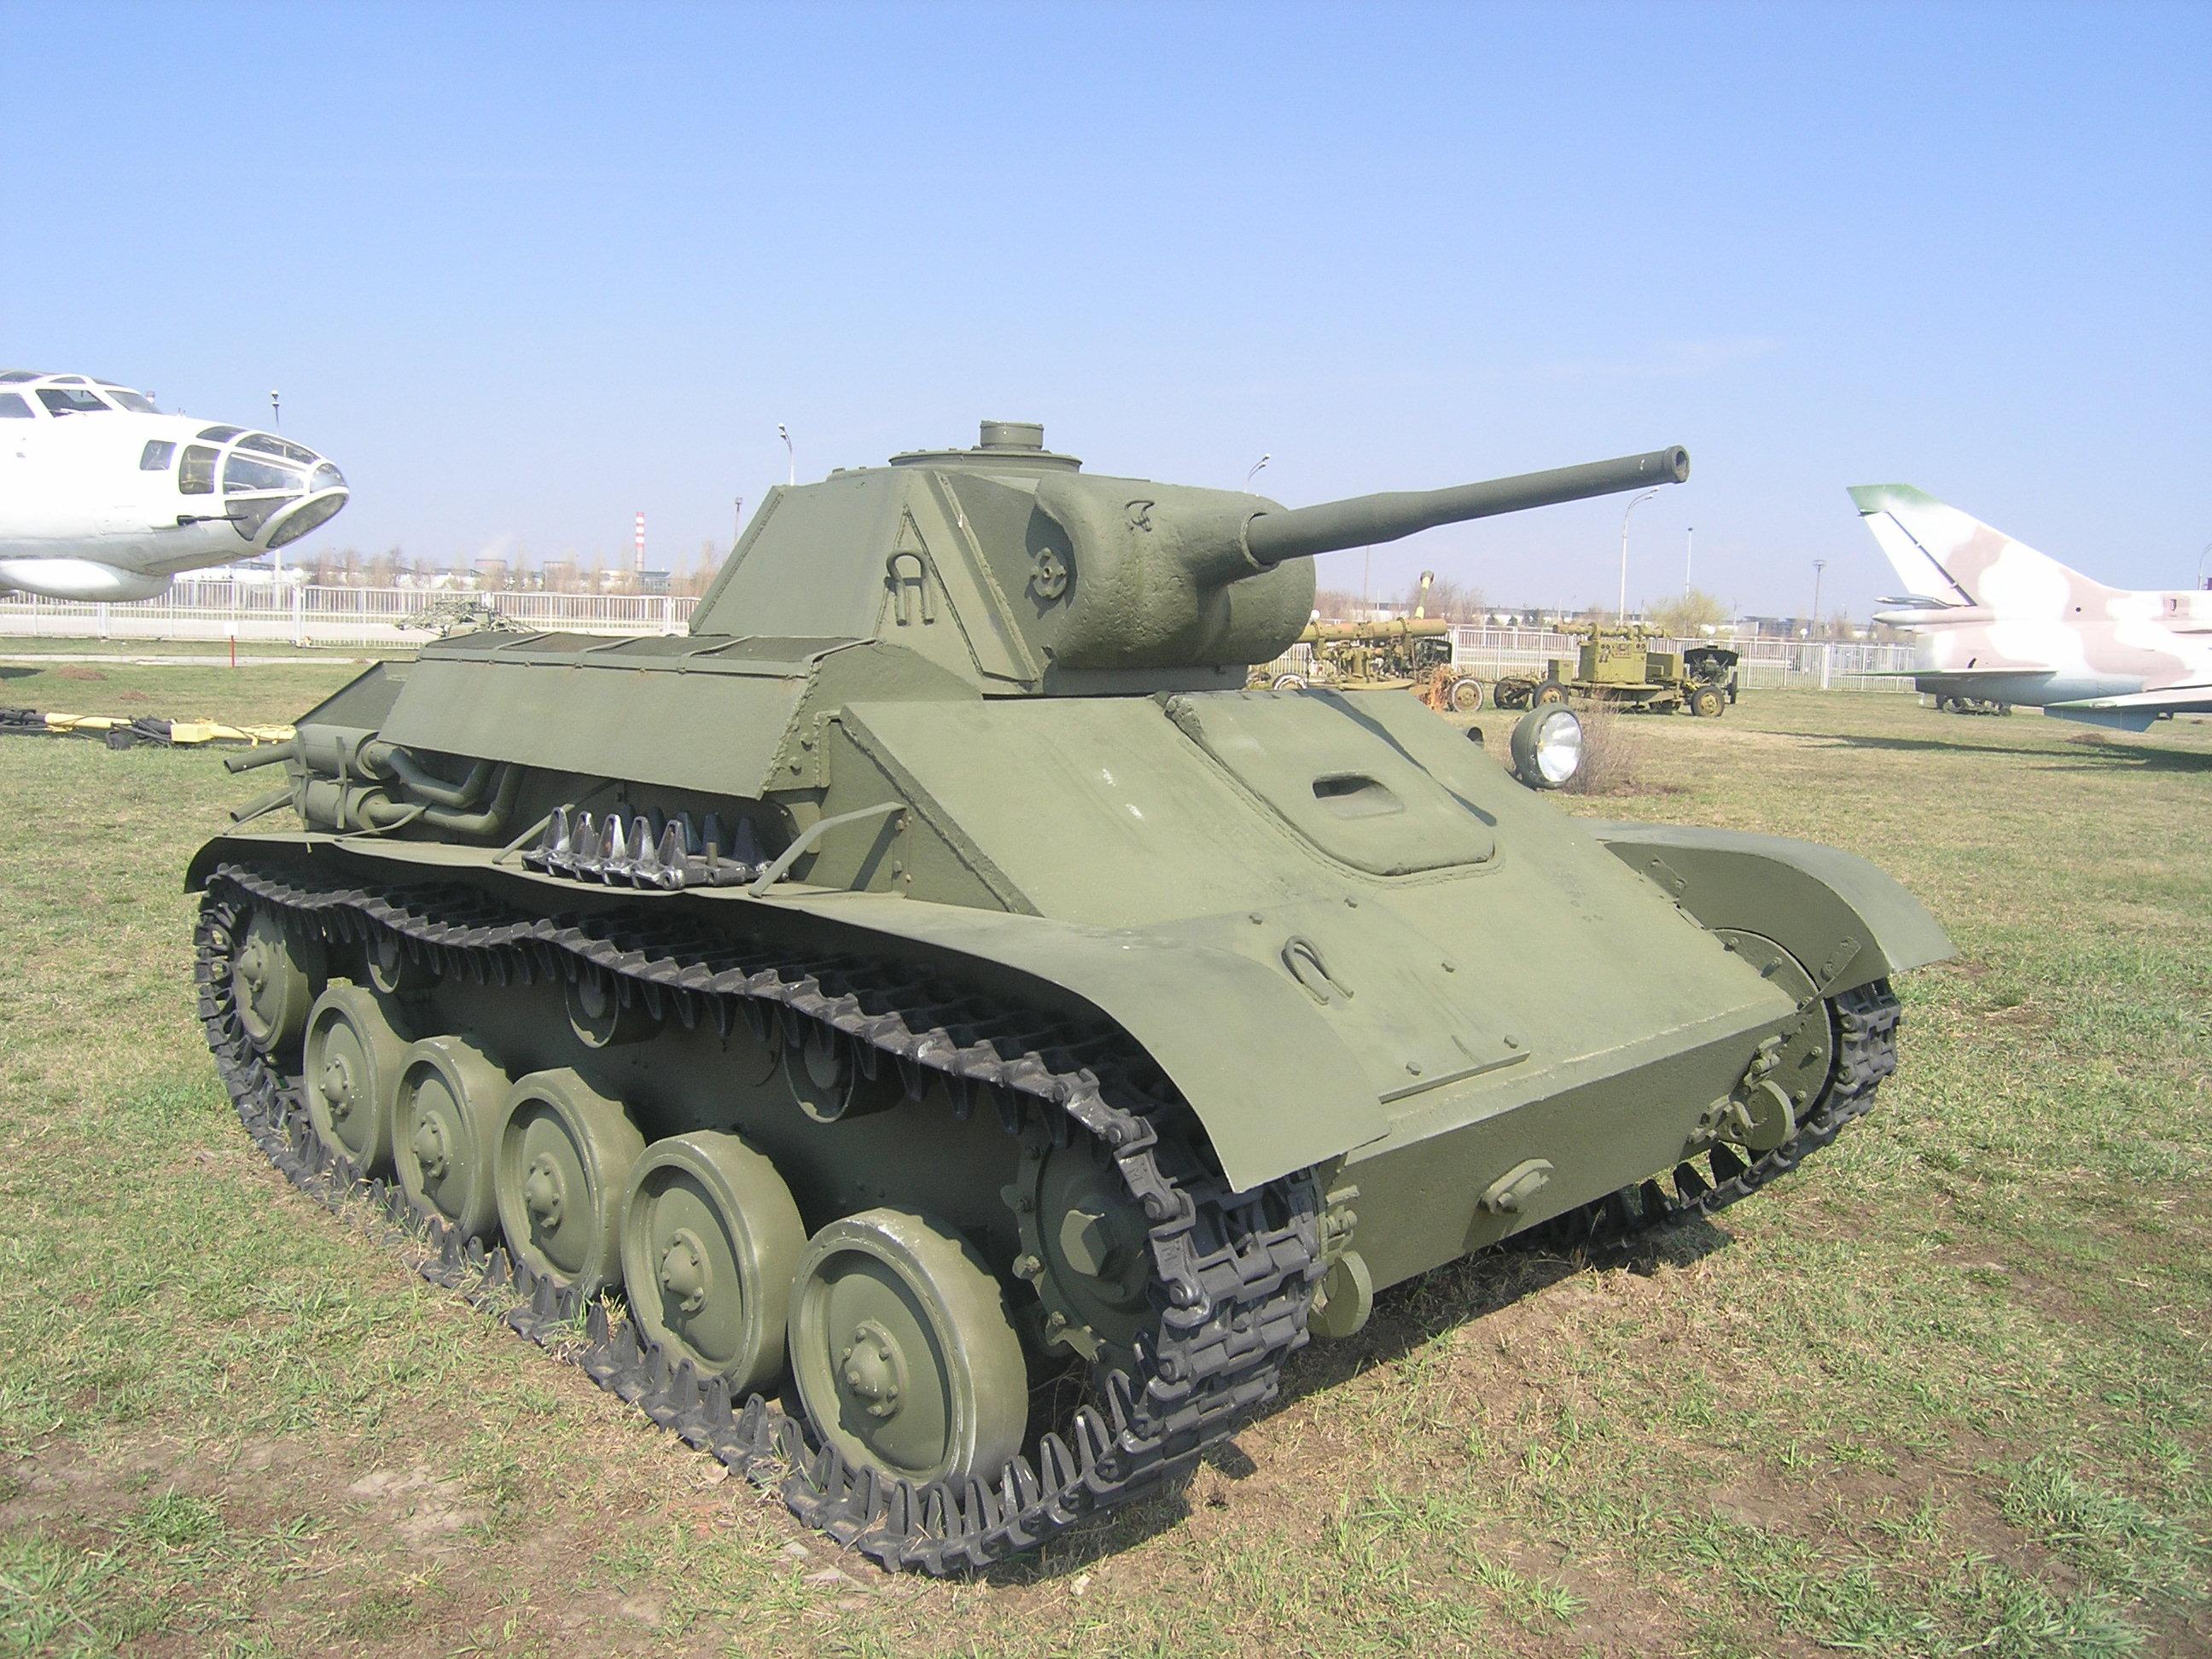 T-70 画像出典:https://ja.wikipedia.org/wiki/T-70_(戦車)